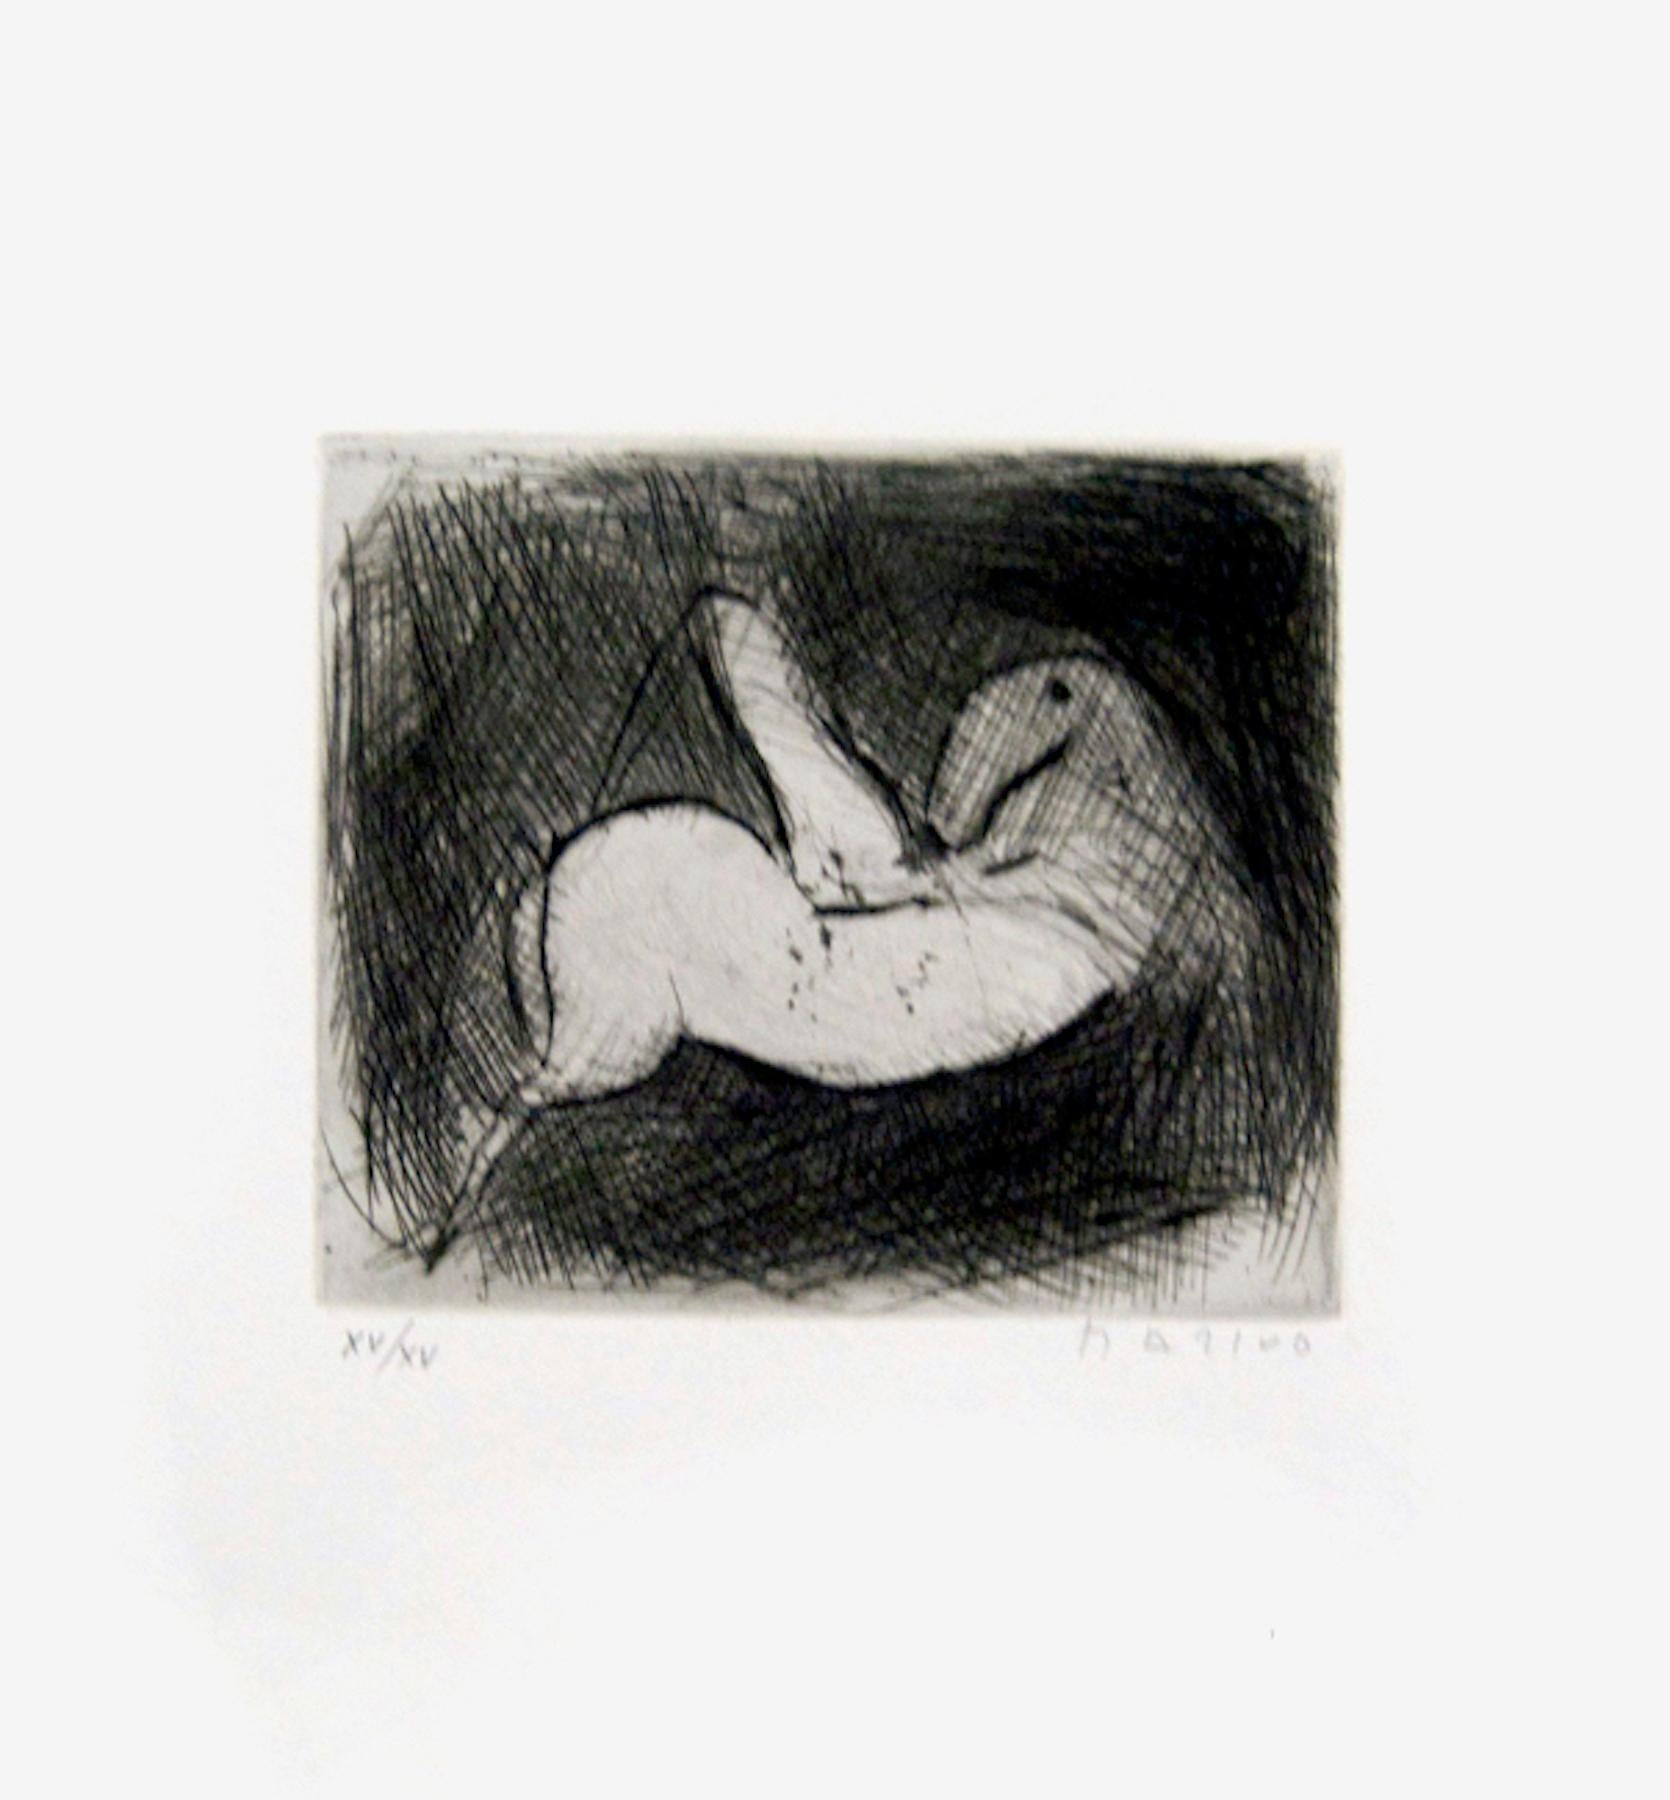 Small Knight - Original Etching by Marino Marini - 1950